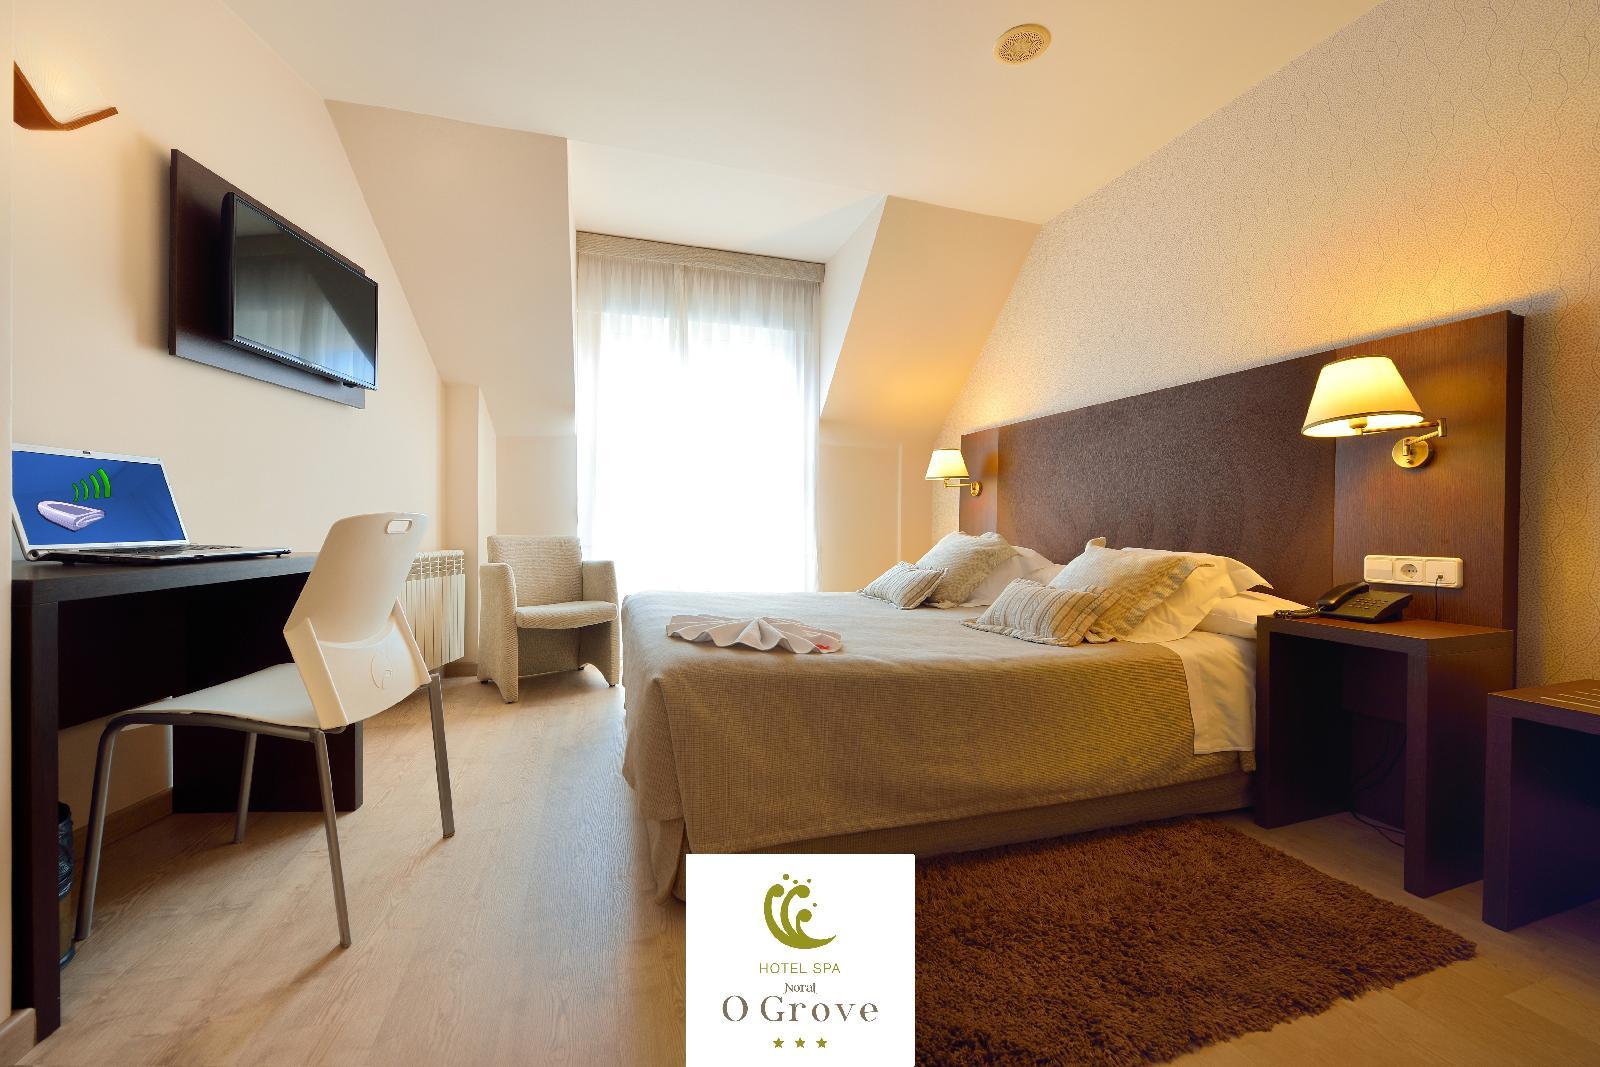 11. Hotel Spa Norat O Grove